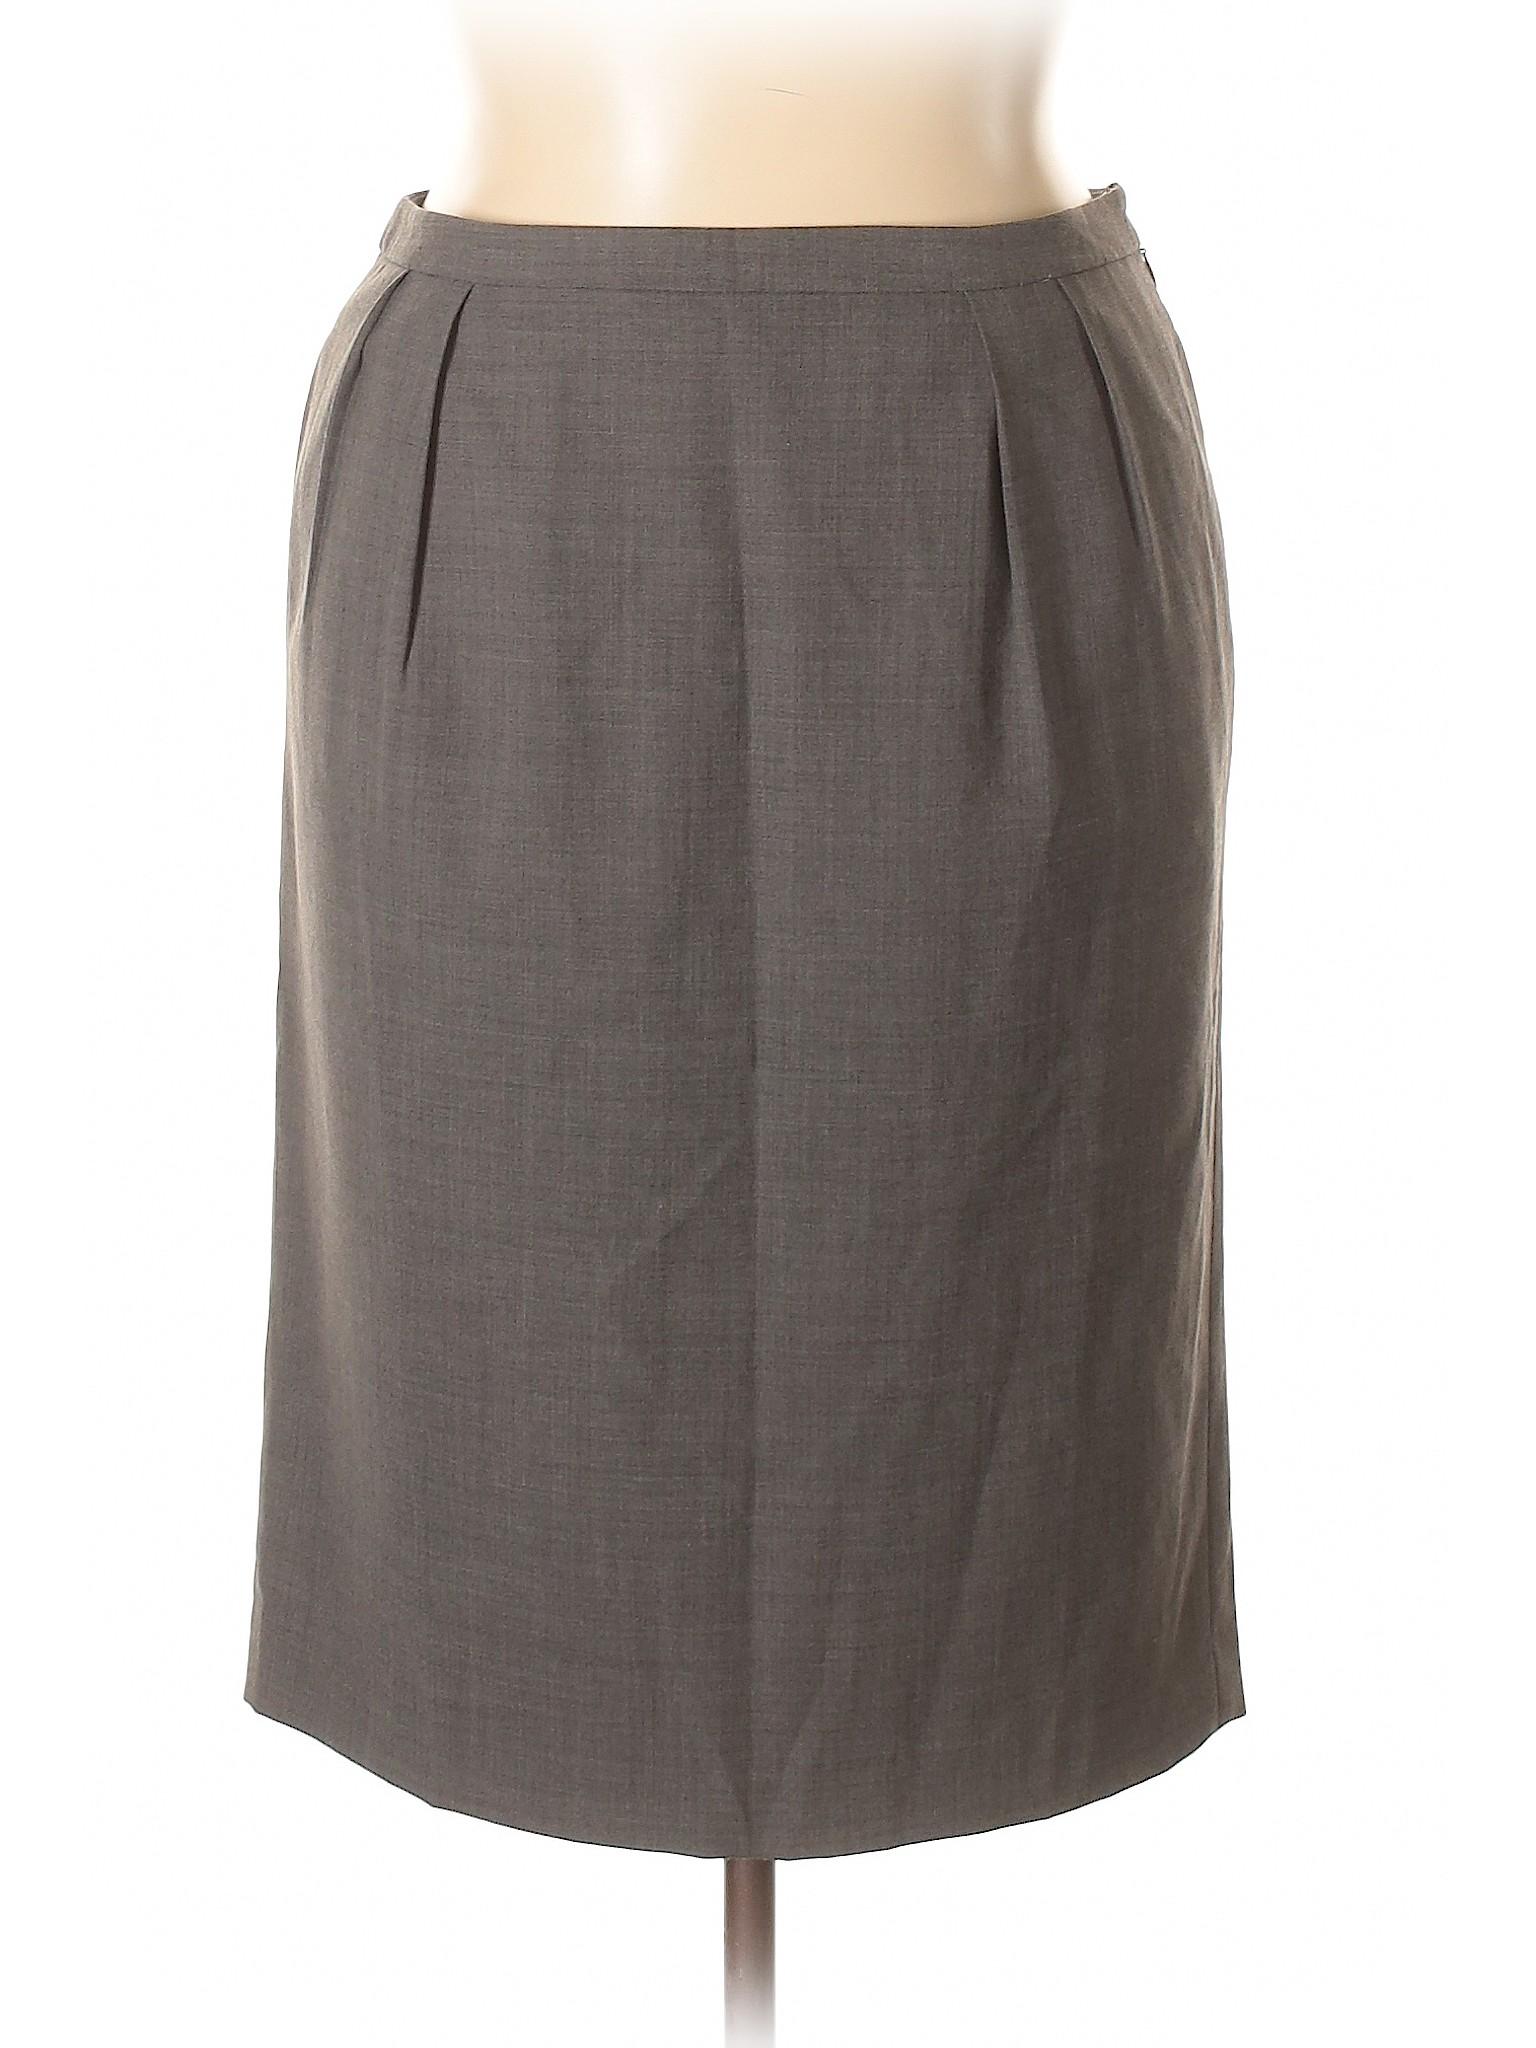 Boutique Skirt Skirt Boutique Skirt Casual Boutique Skirt Skirt Skirt Boutique Boutique Casual Casual Boutique Casual Casual Casual qwAF1n7